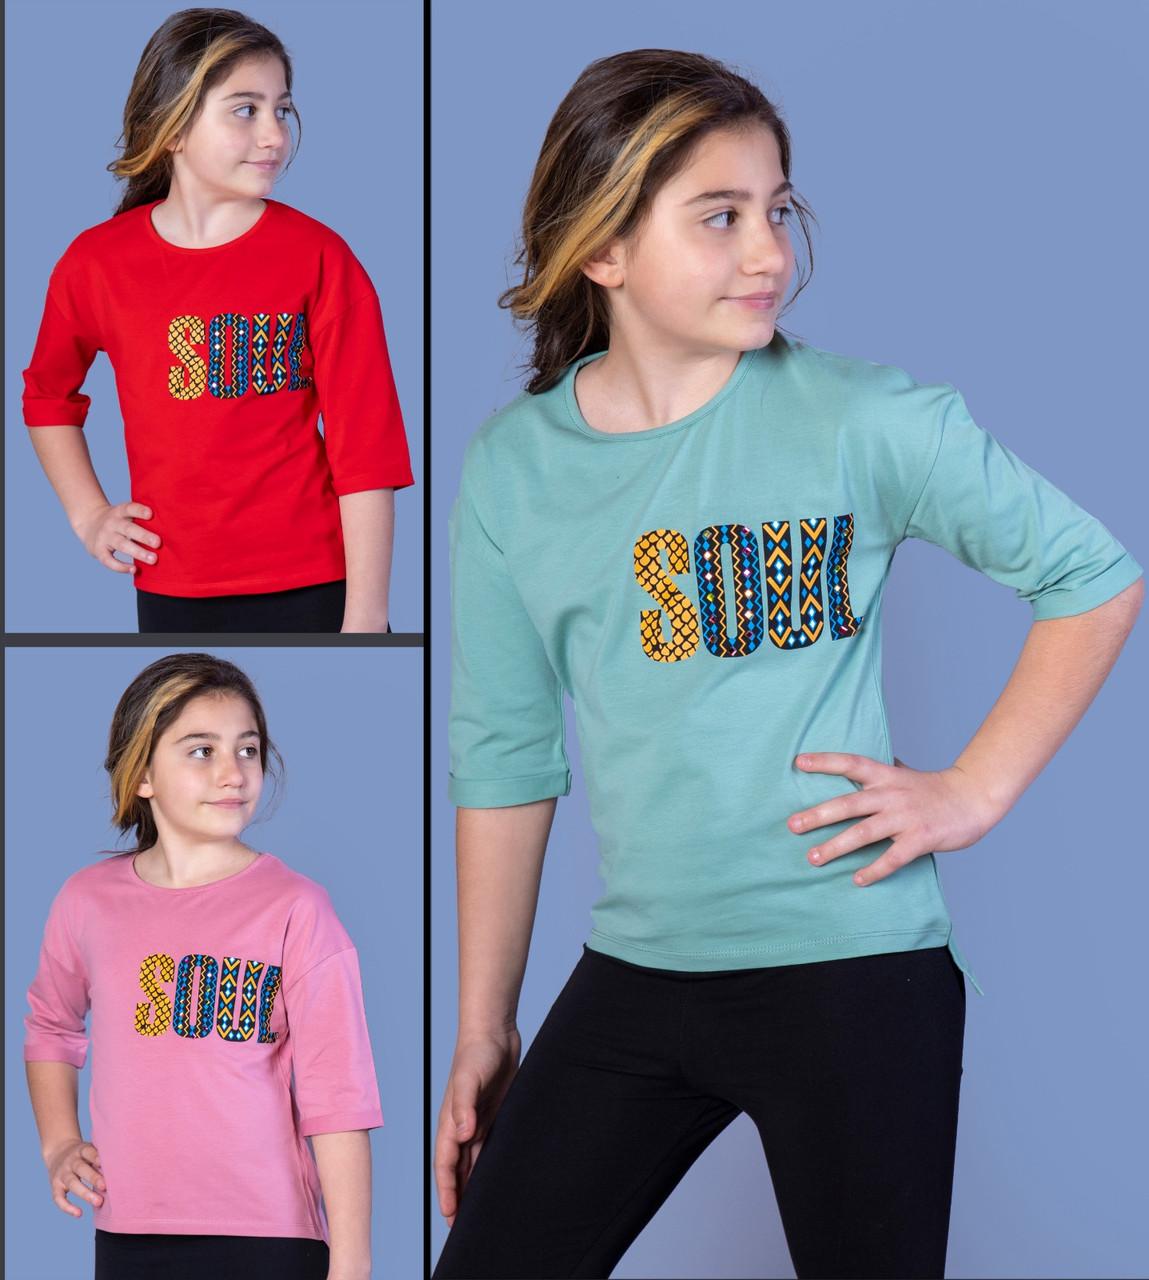 Детская  футболка 3/4 рукав (девочка),  8-10-12-14 лет,  SOUL.